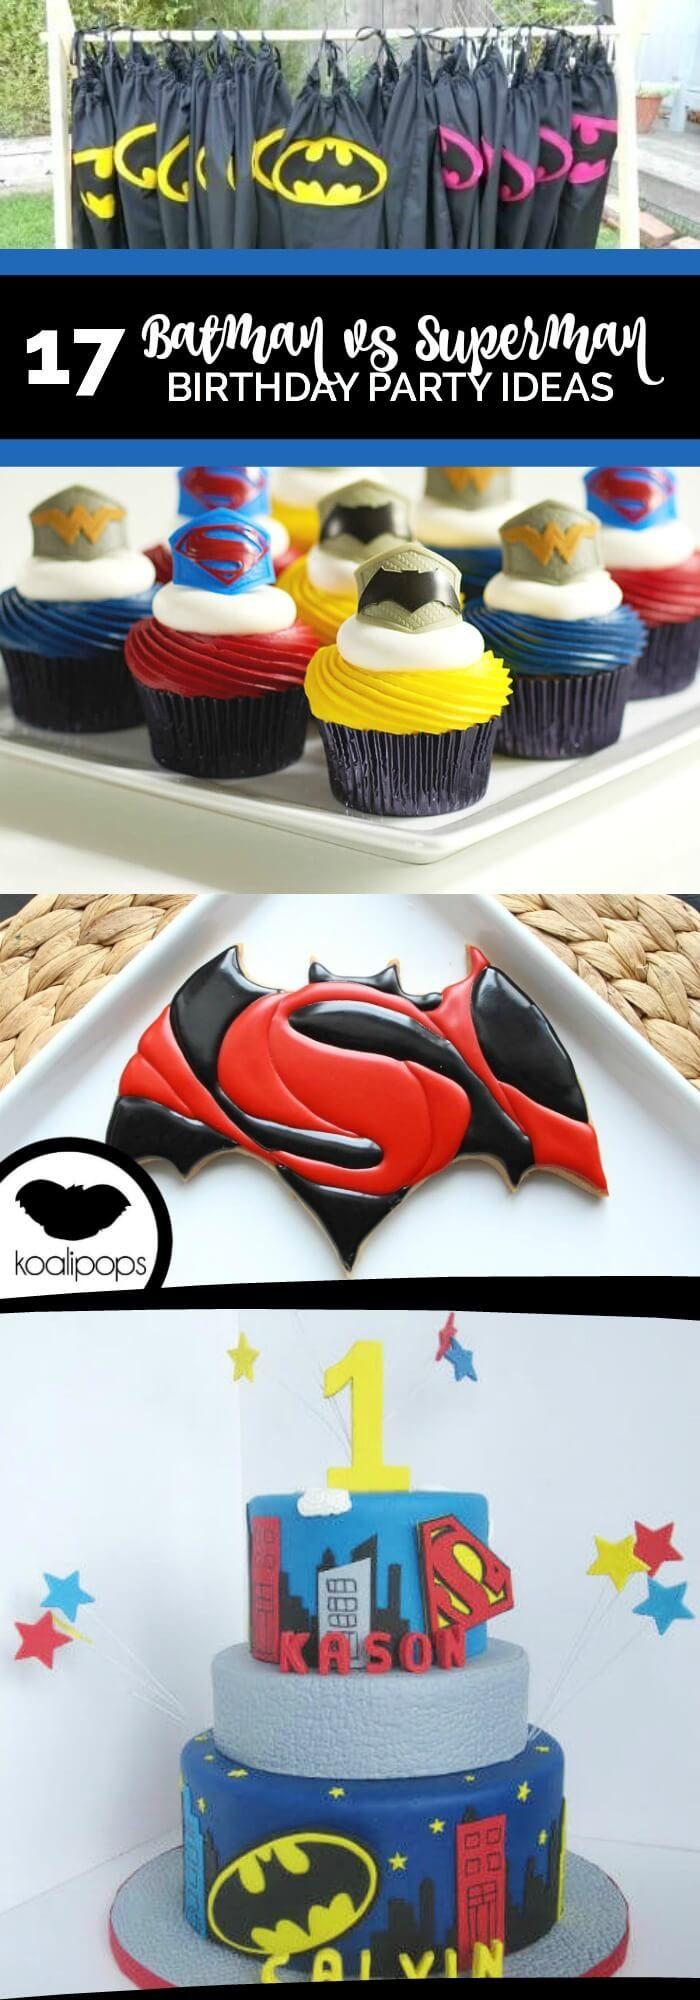 17 Awesome Batman vs. Superman Party Ideas